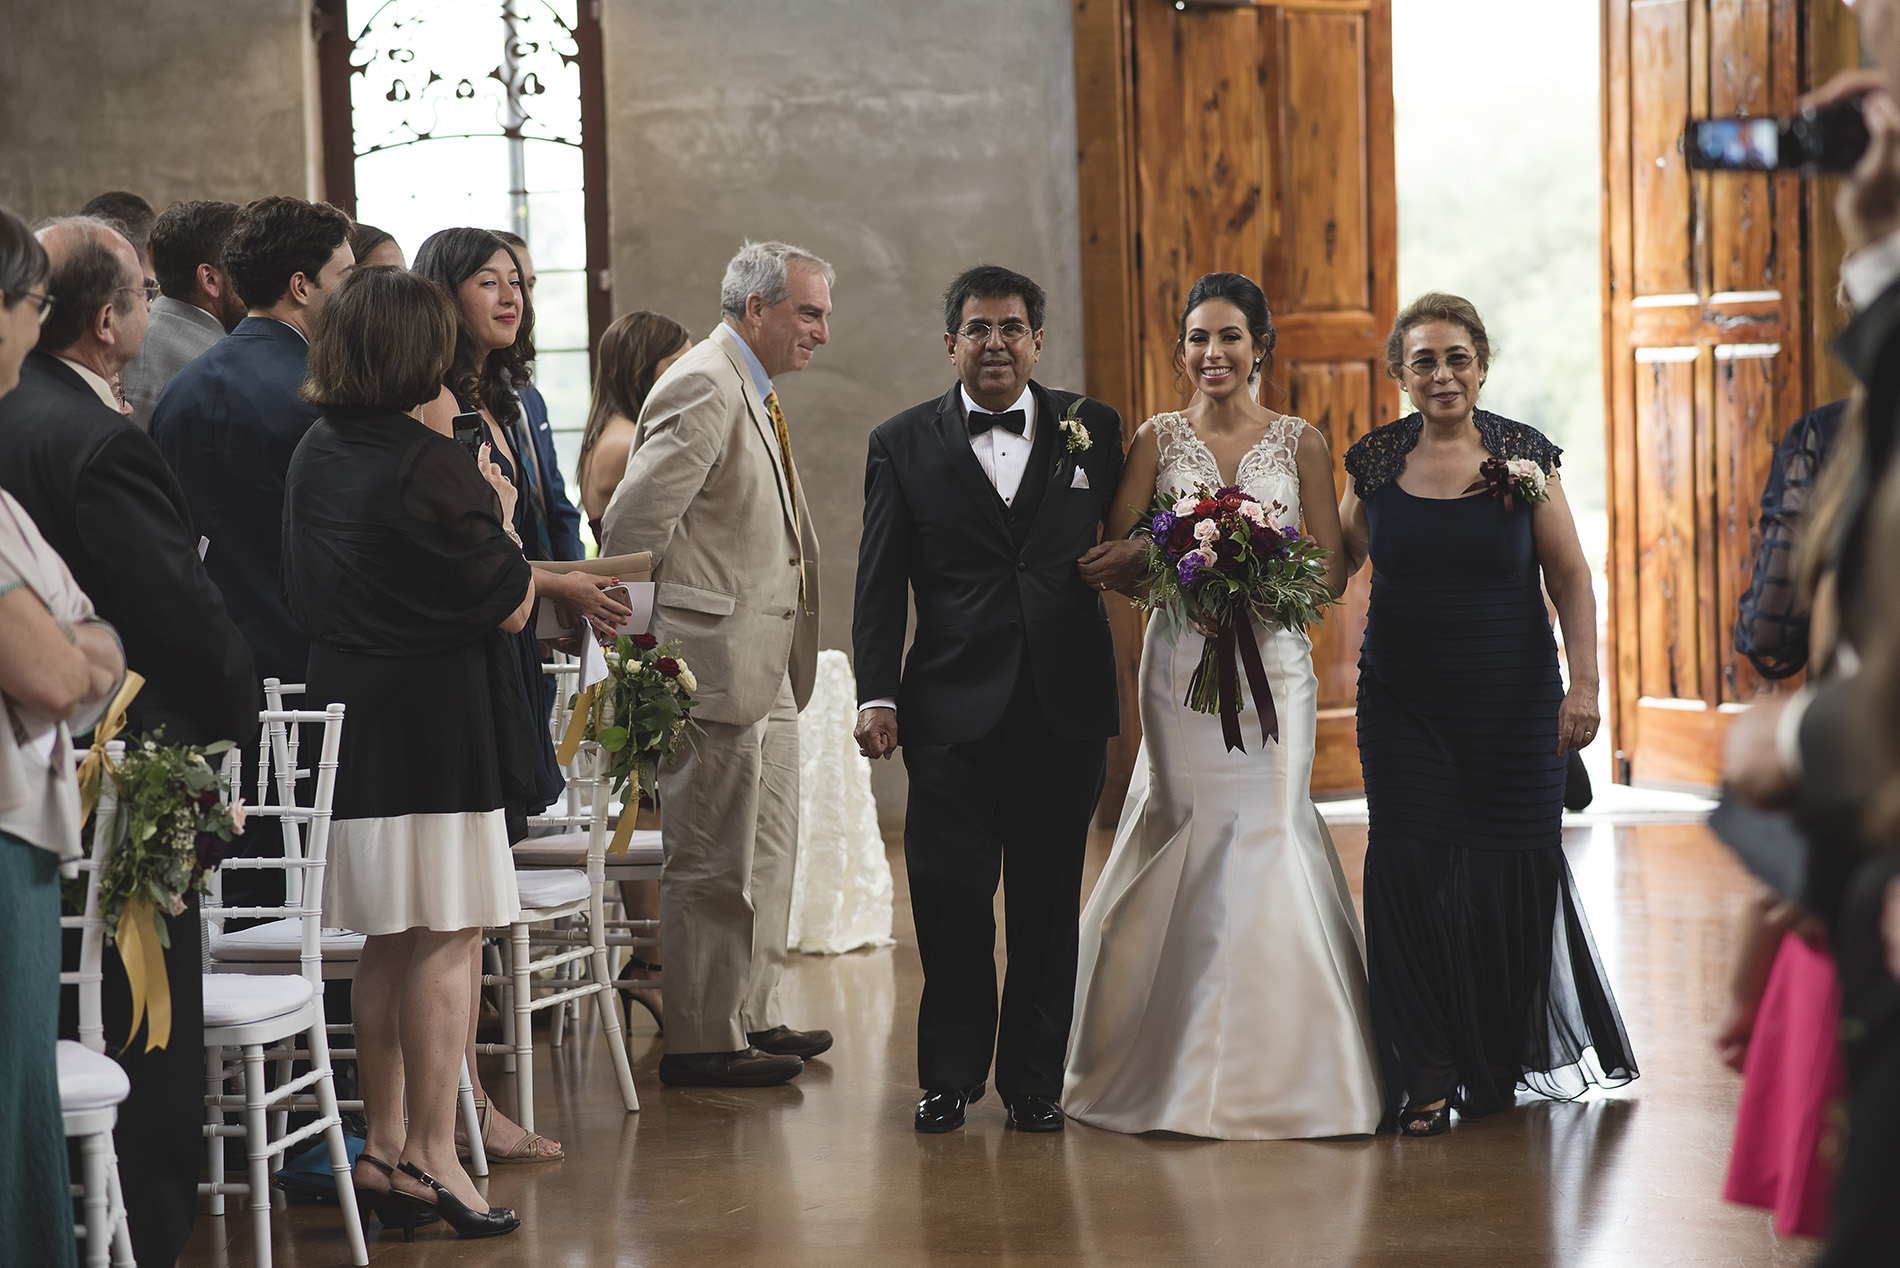 Houston-venue-Olde-Dobbin-Station-Romantic-Classic-Wedding-Photographer-058.jpg